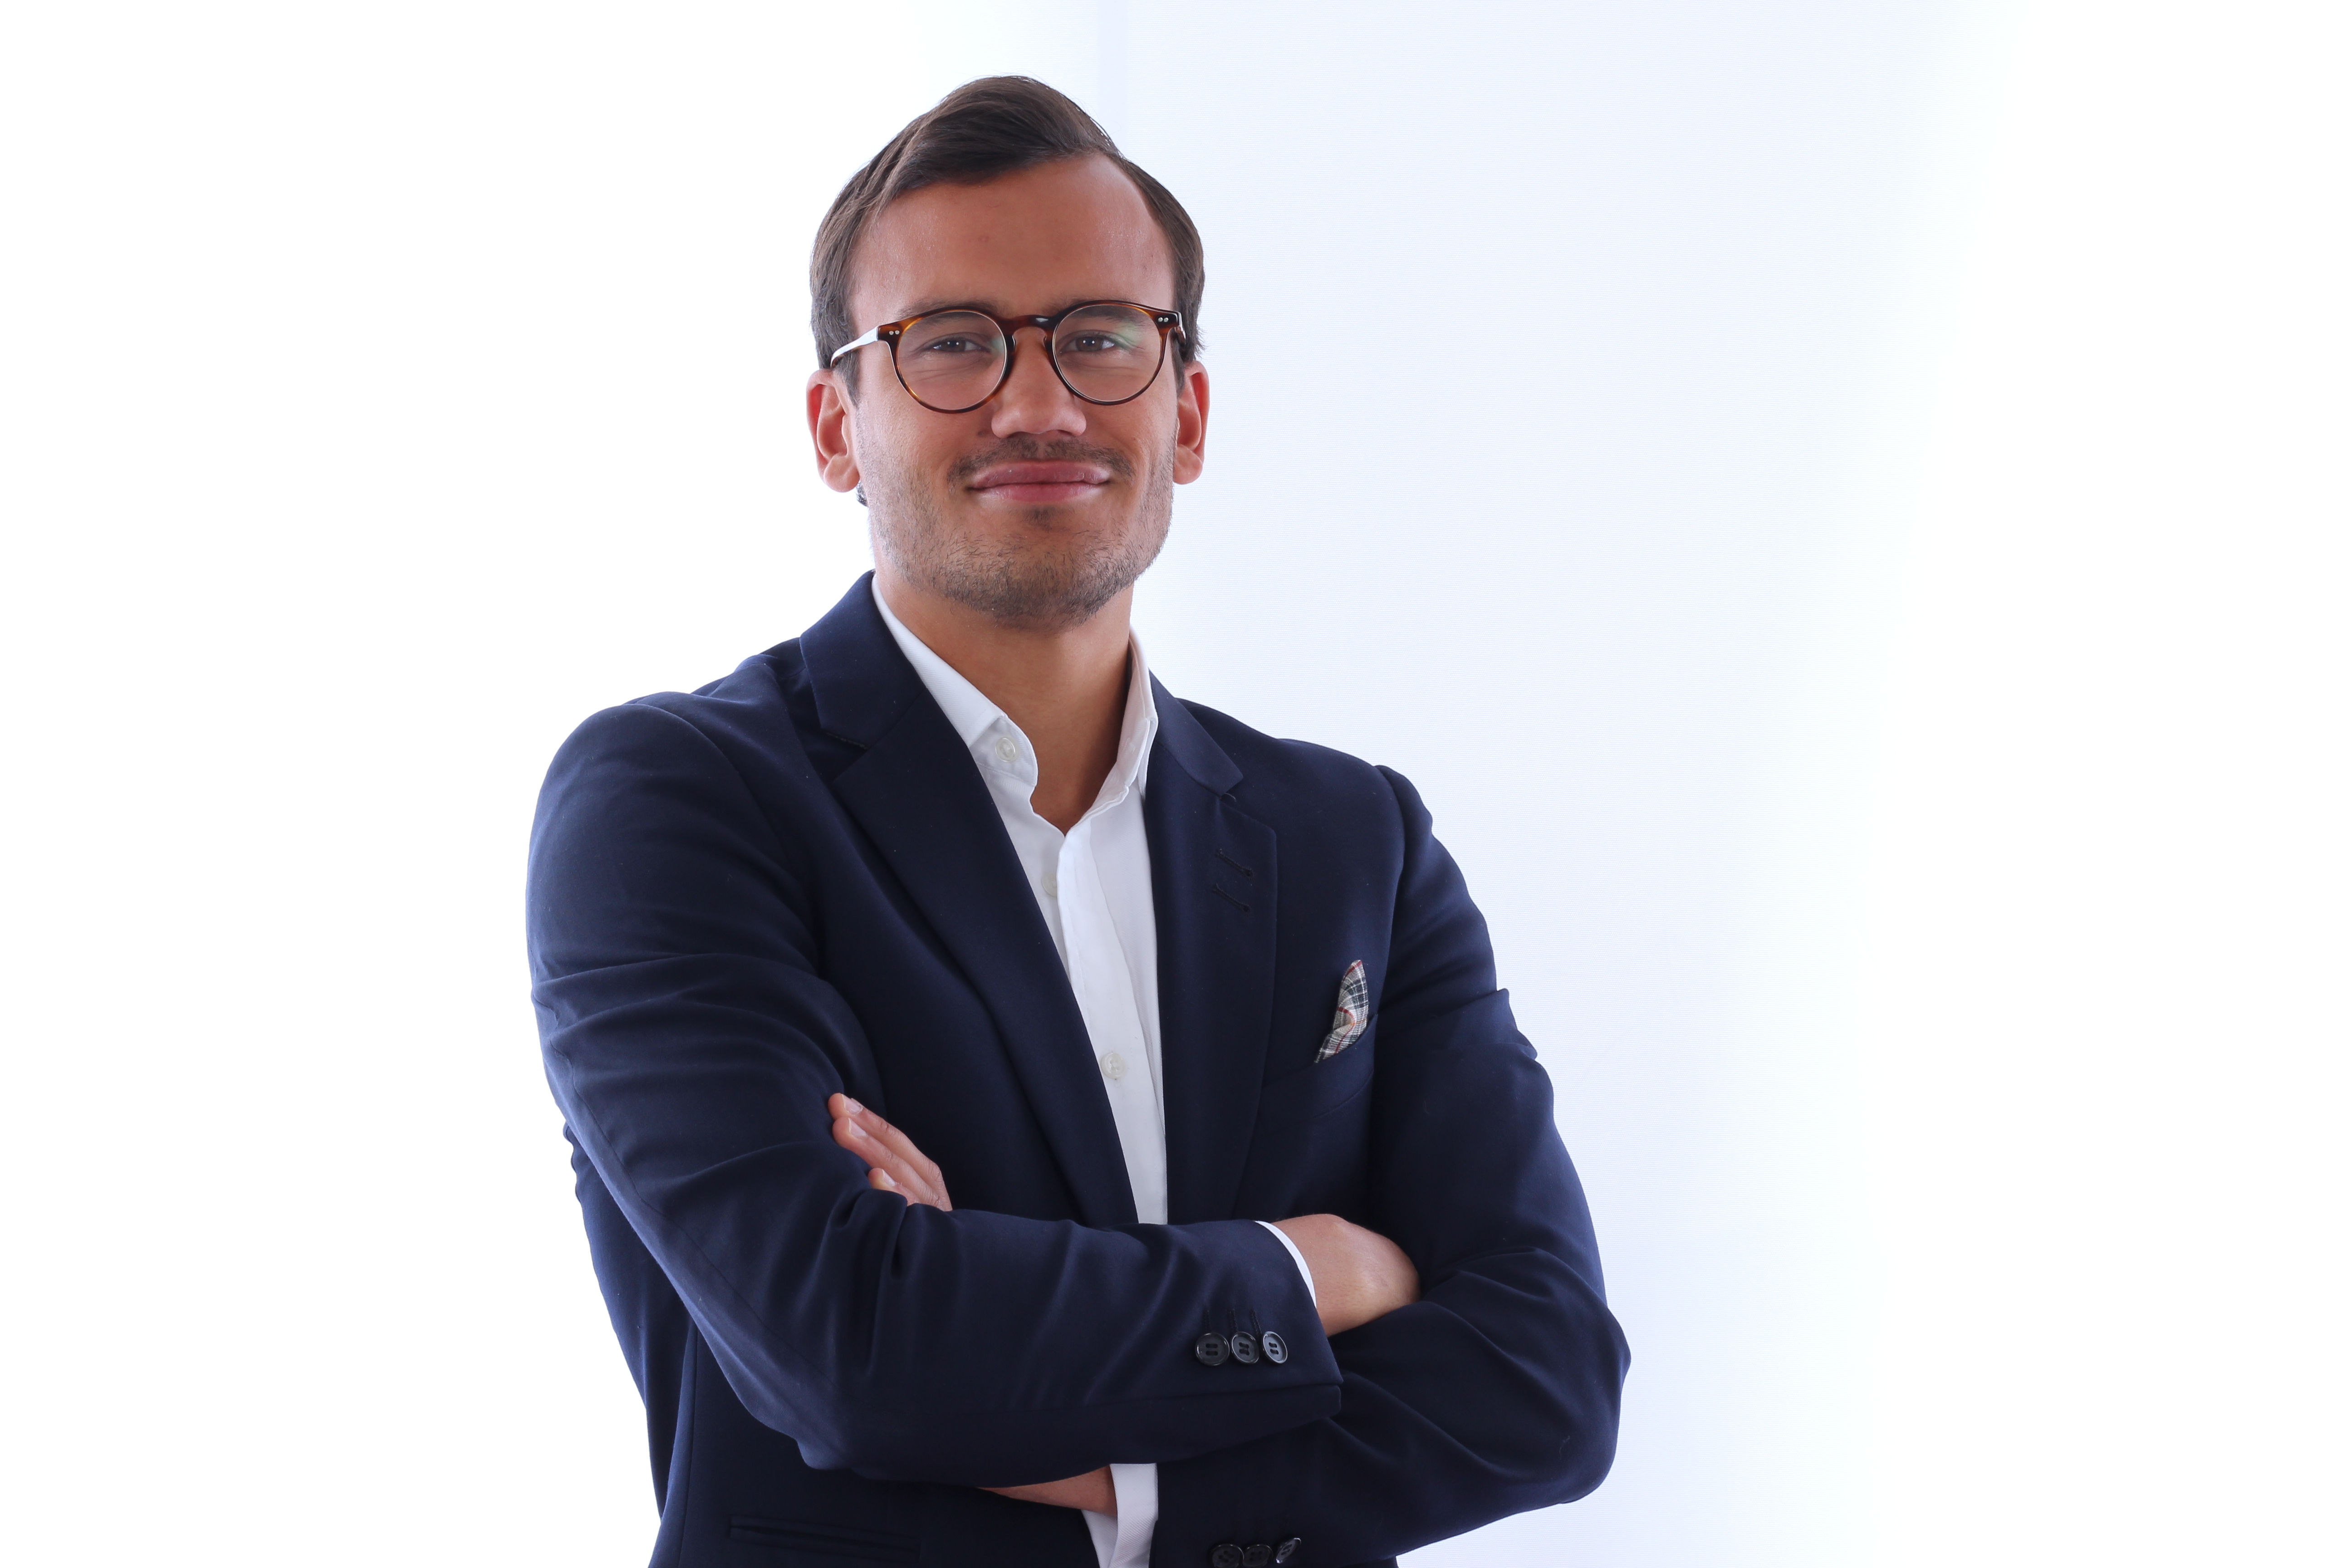 Philip Ternhem - Senior Sales Manager, Financial Services at Trustly